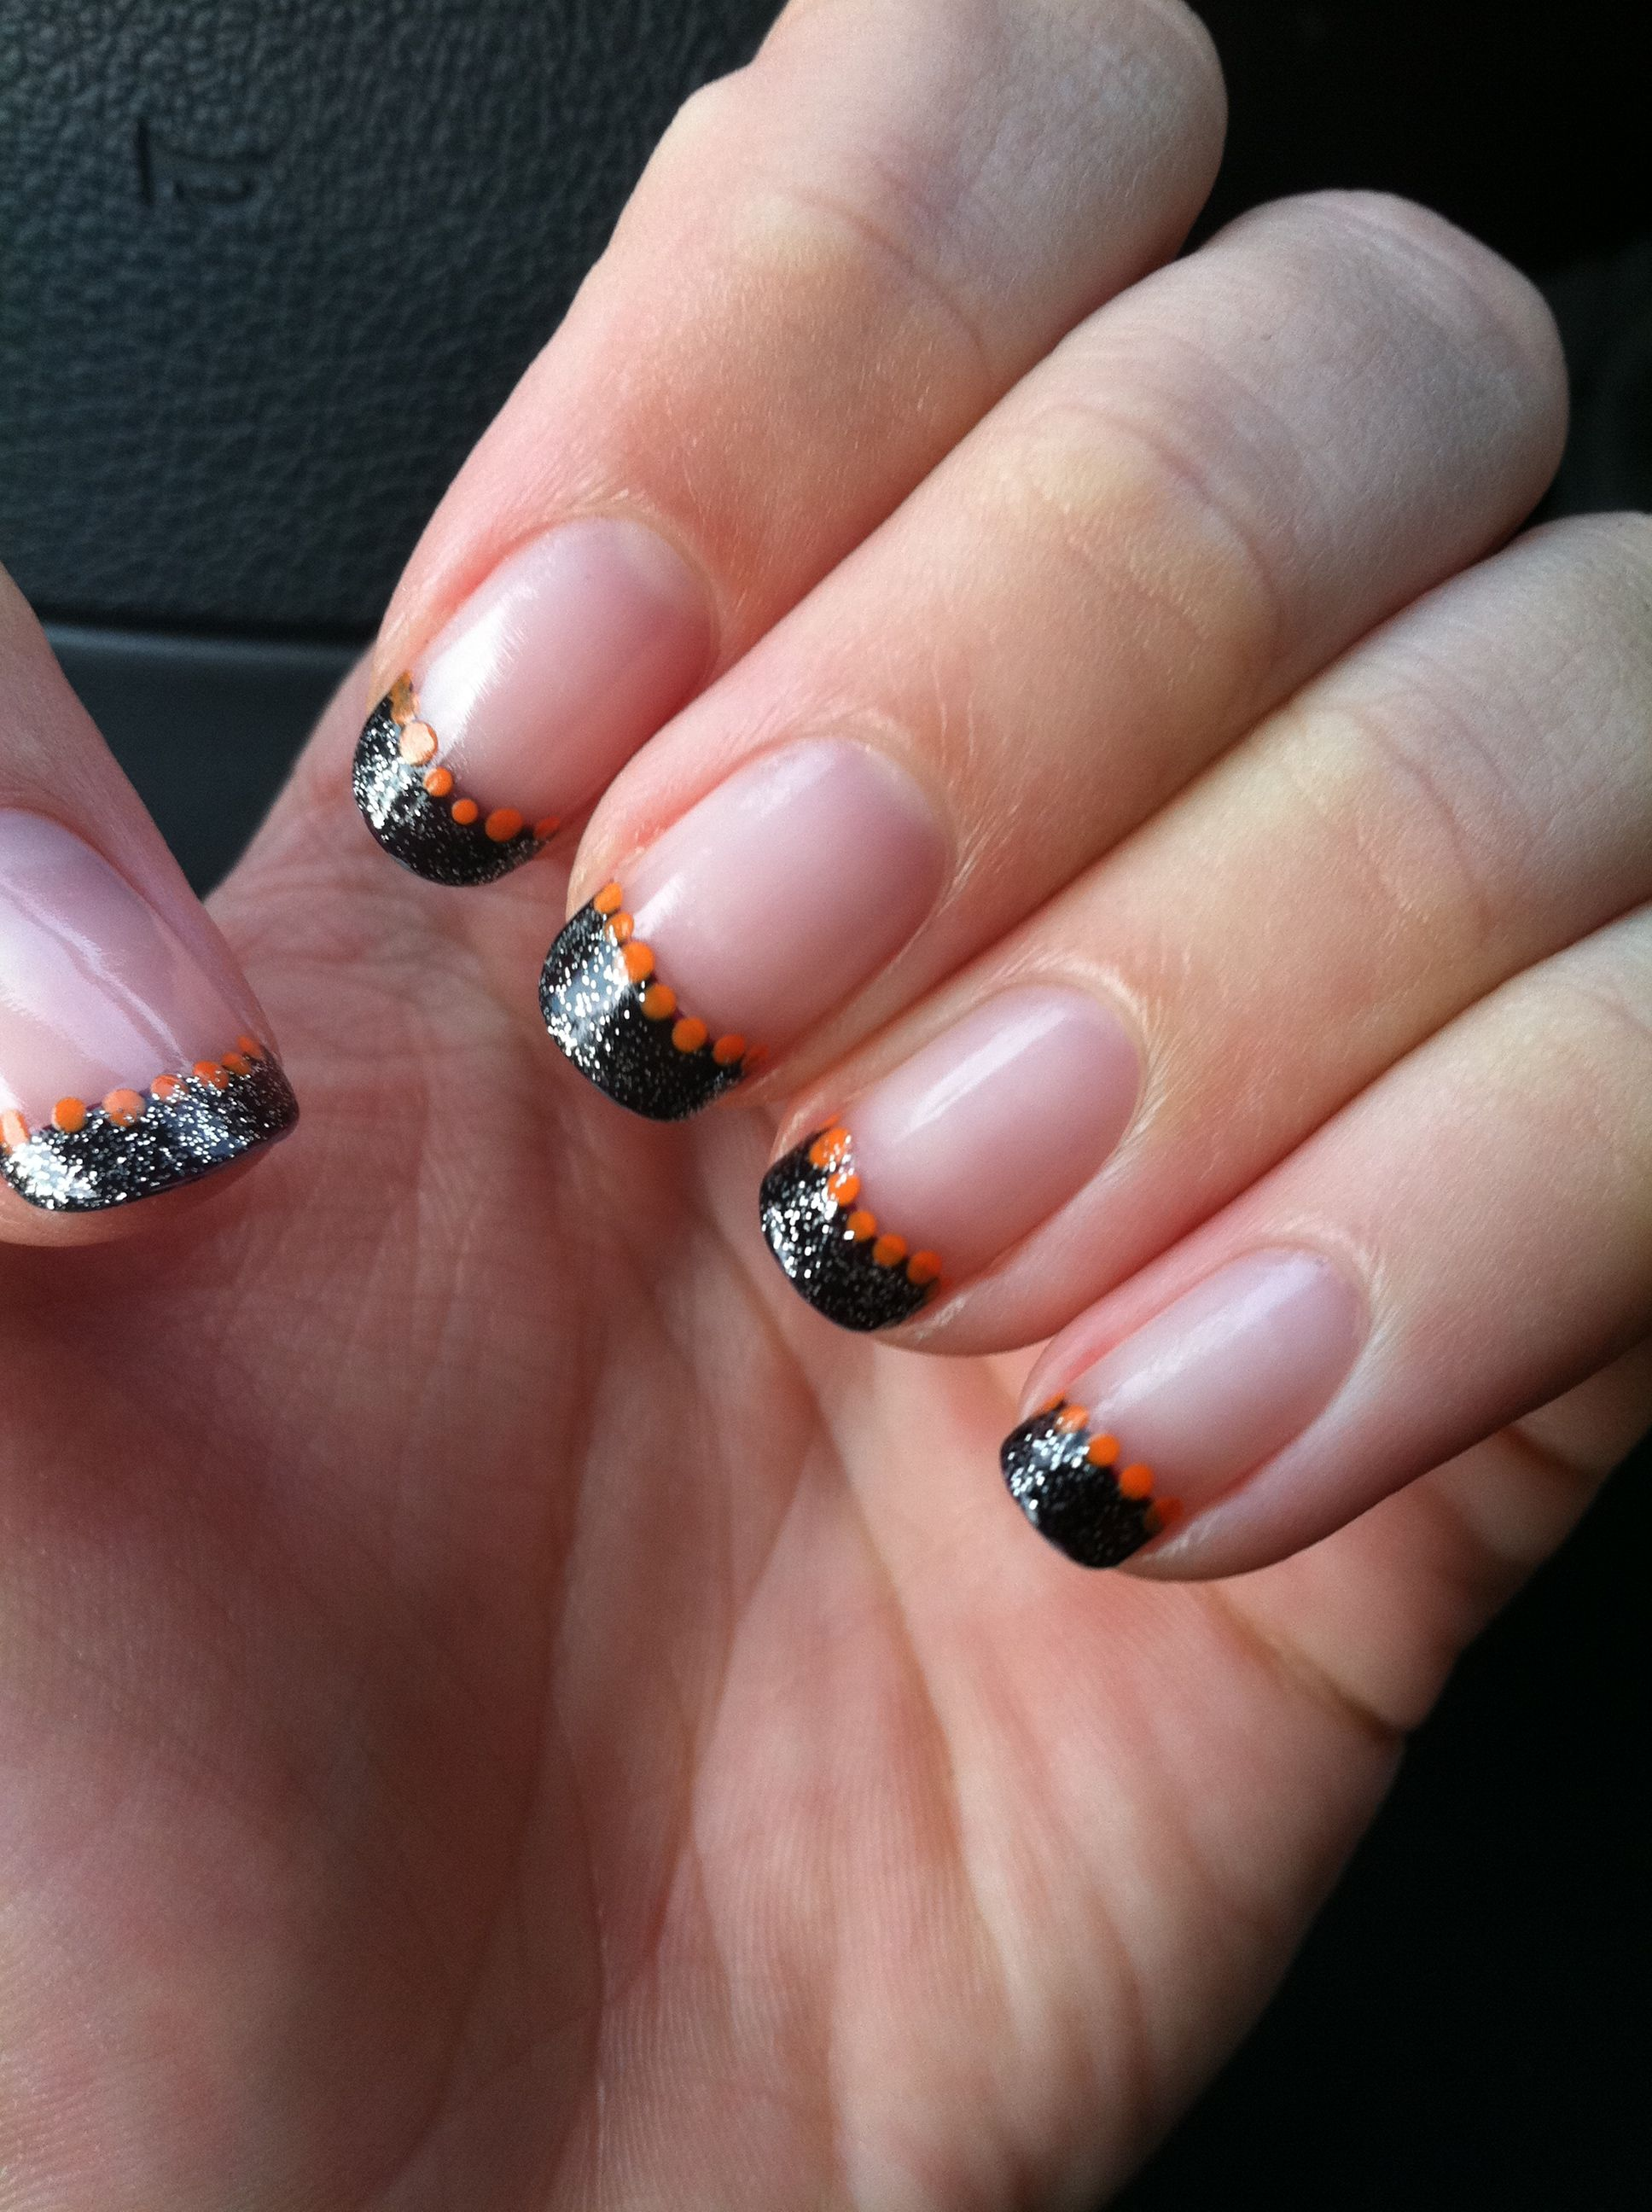 Cute Halloween nails | Halloween nail art, Cute halloween ...